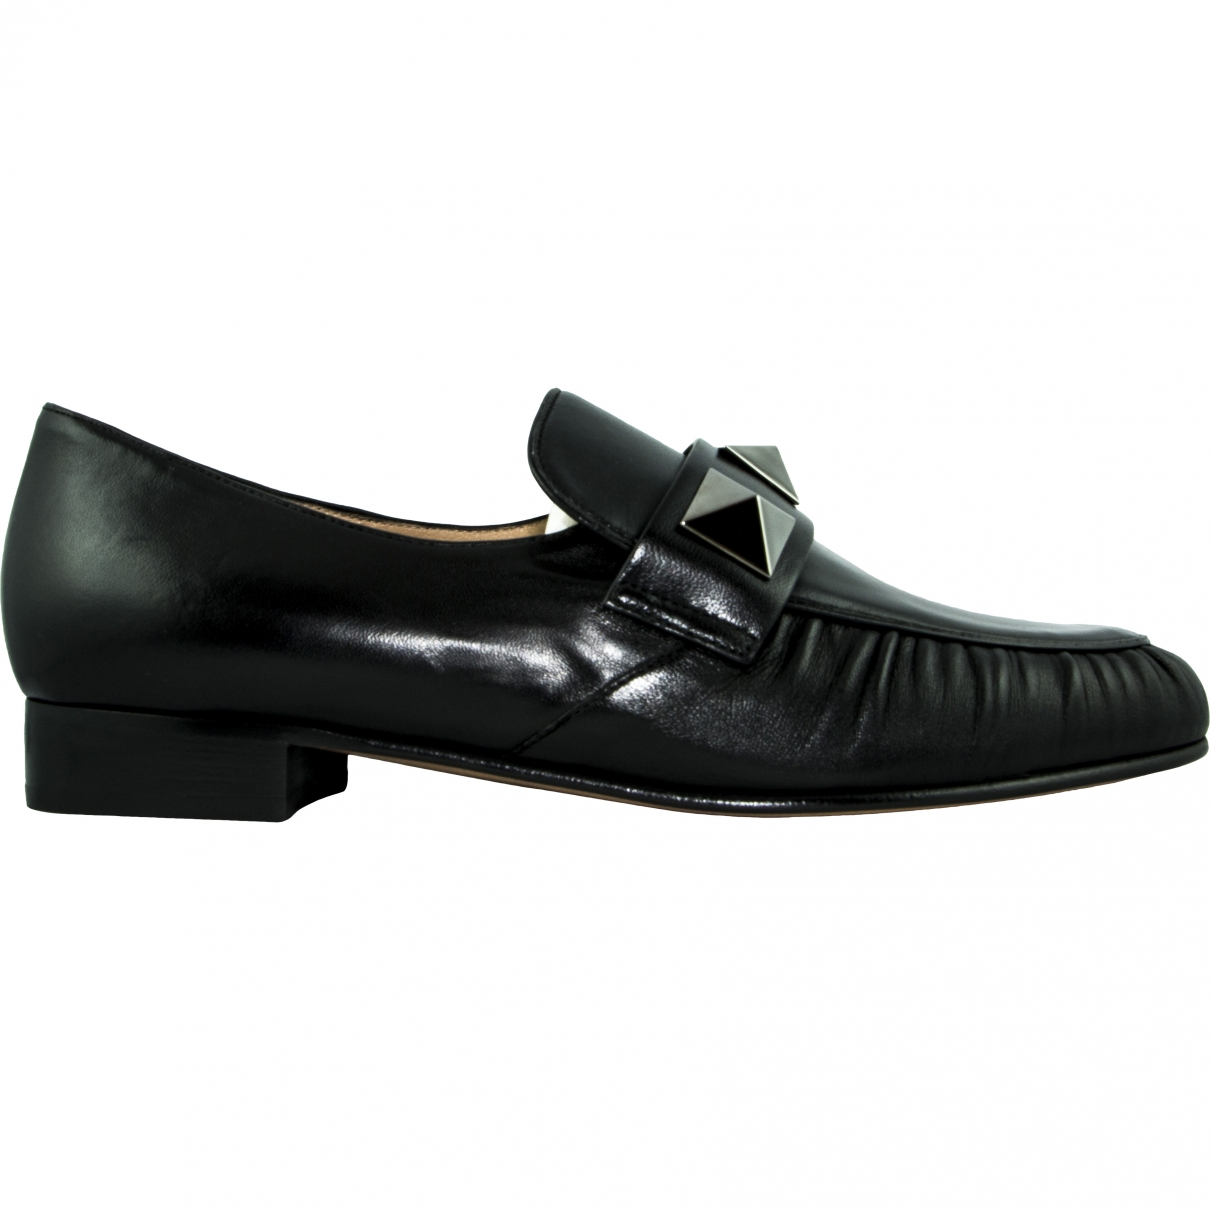 Valentino Garavani Rockstud Black Leather Flats for Women 38 EU